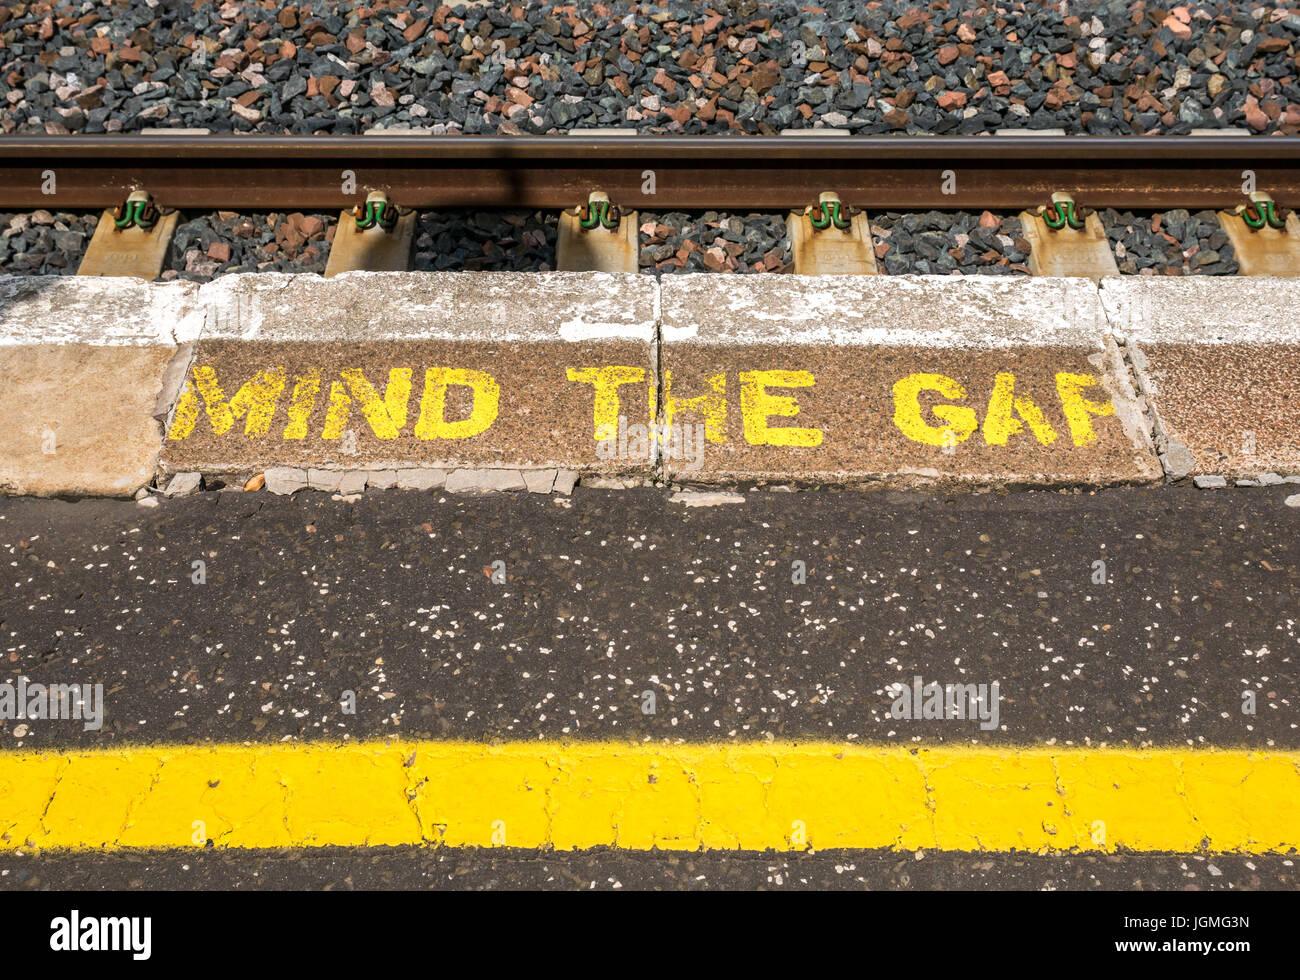 Mind the Gap warning painted in yellow letters on rural station platform, Drem, East Lothian, Scotland, UK - Stock Image